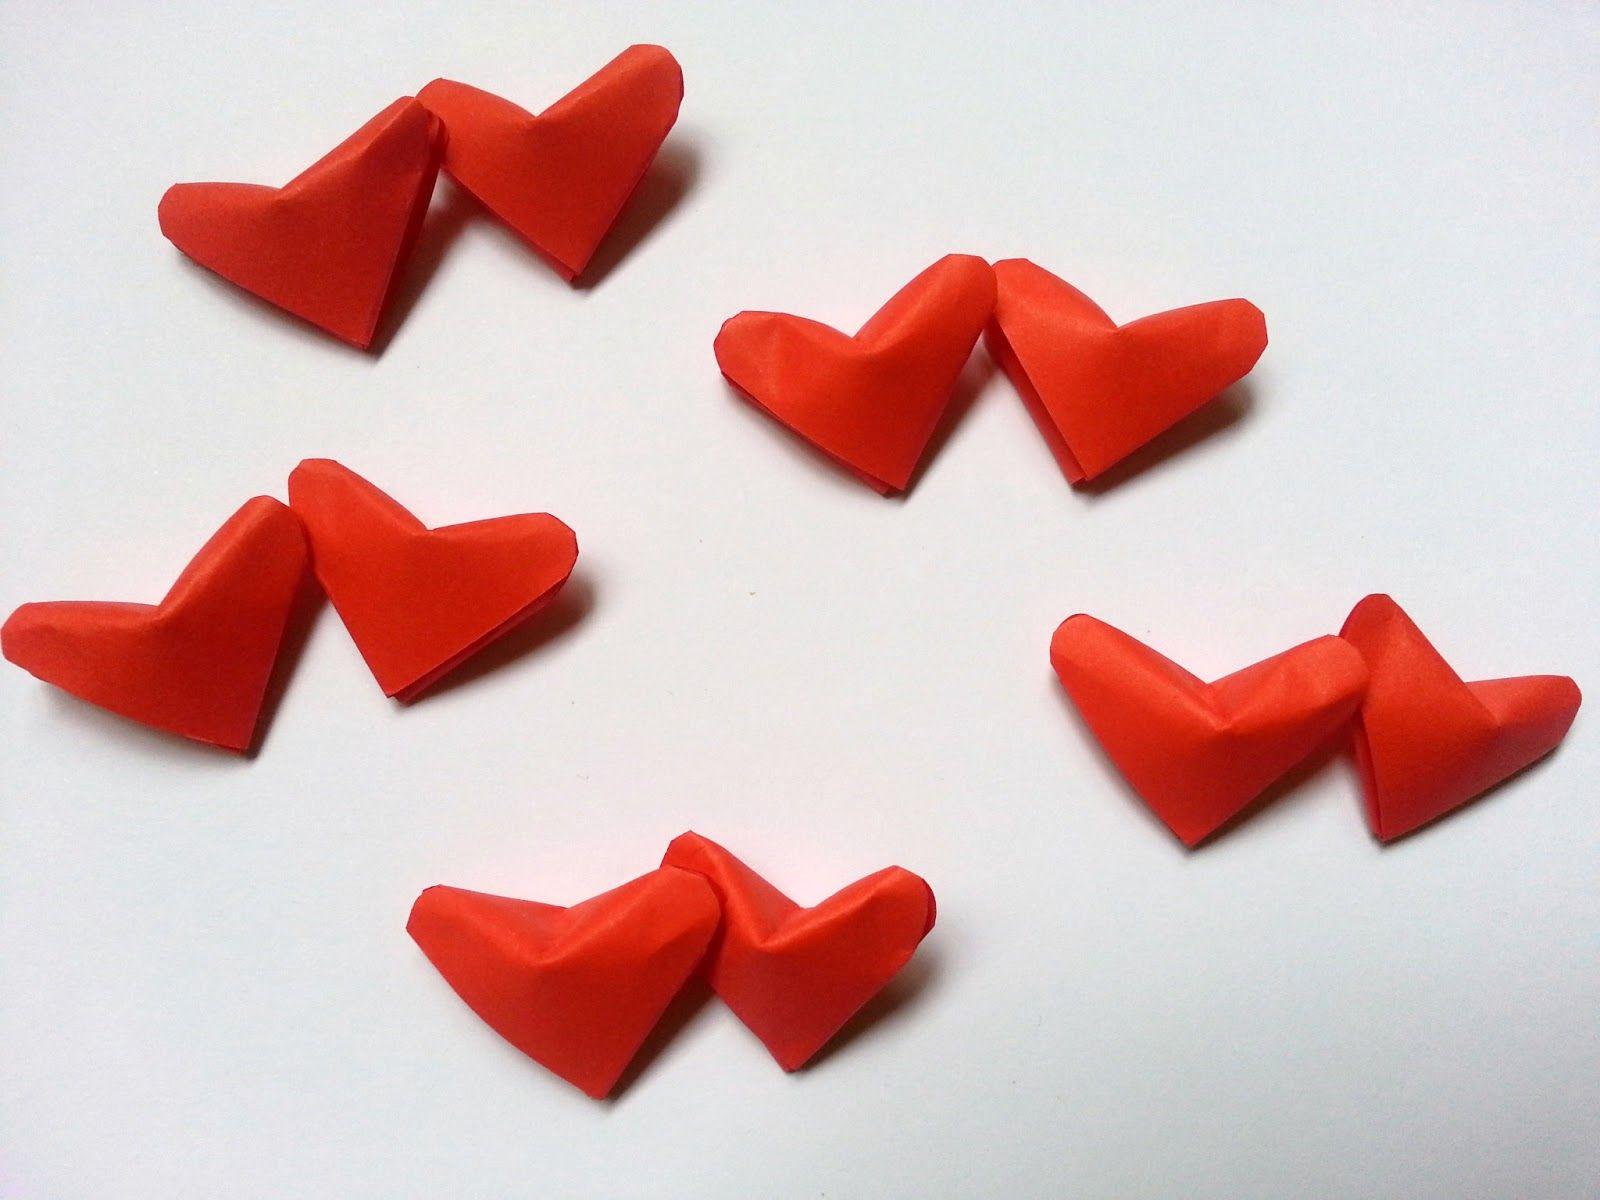 3D Origami Hearts | Hearts | Pinterest | 3D Origami ... - photo#13